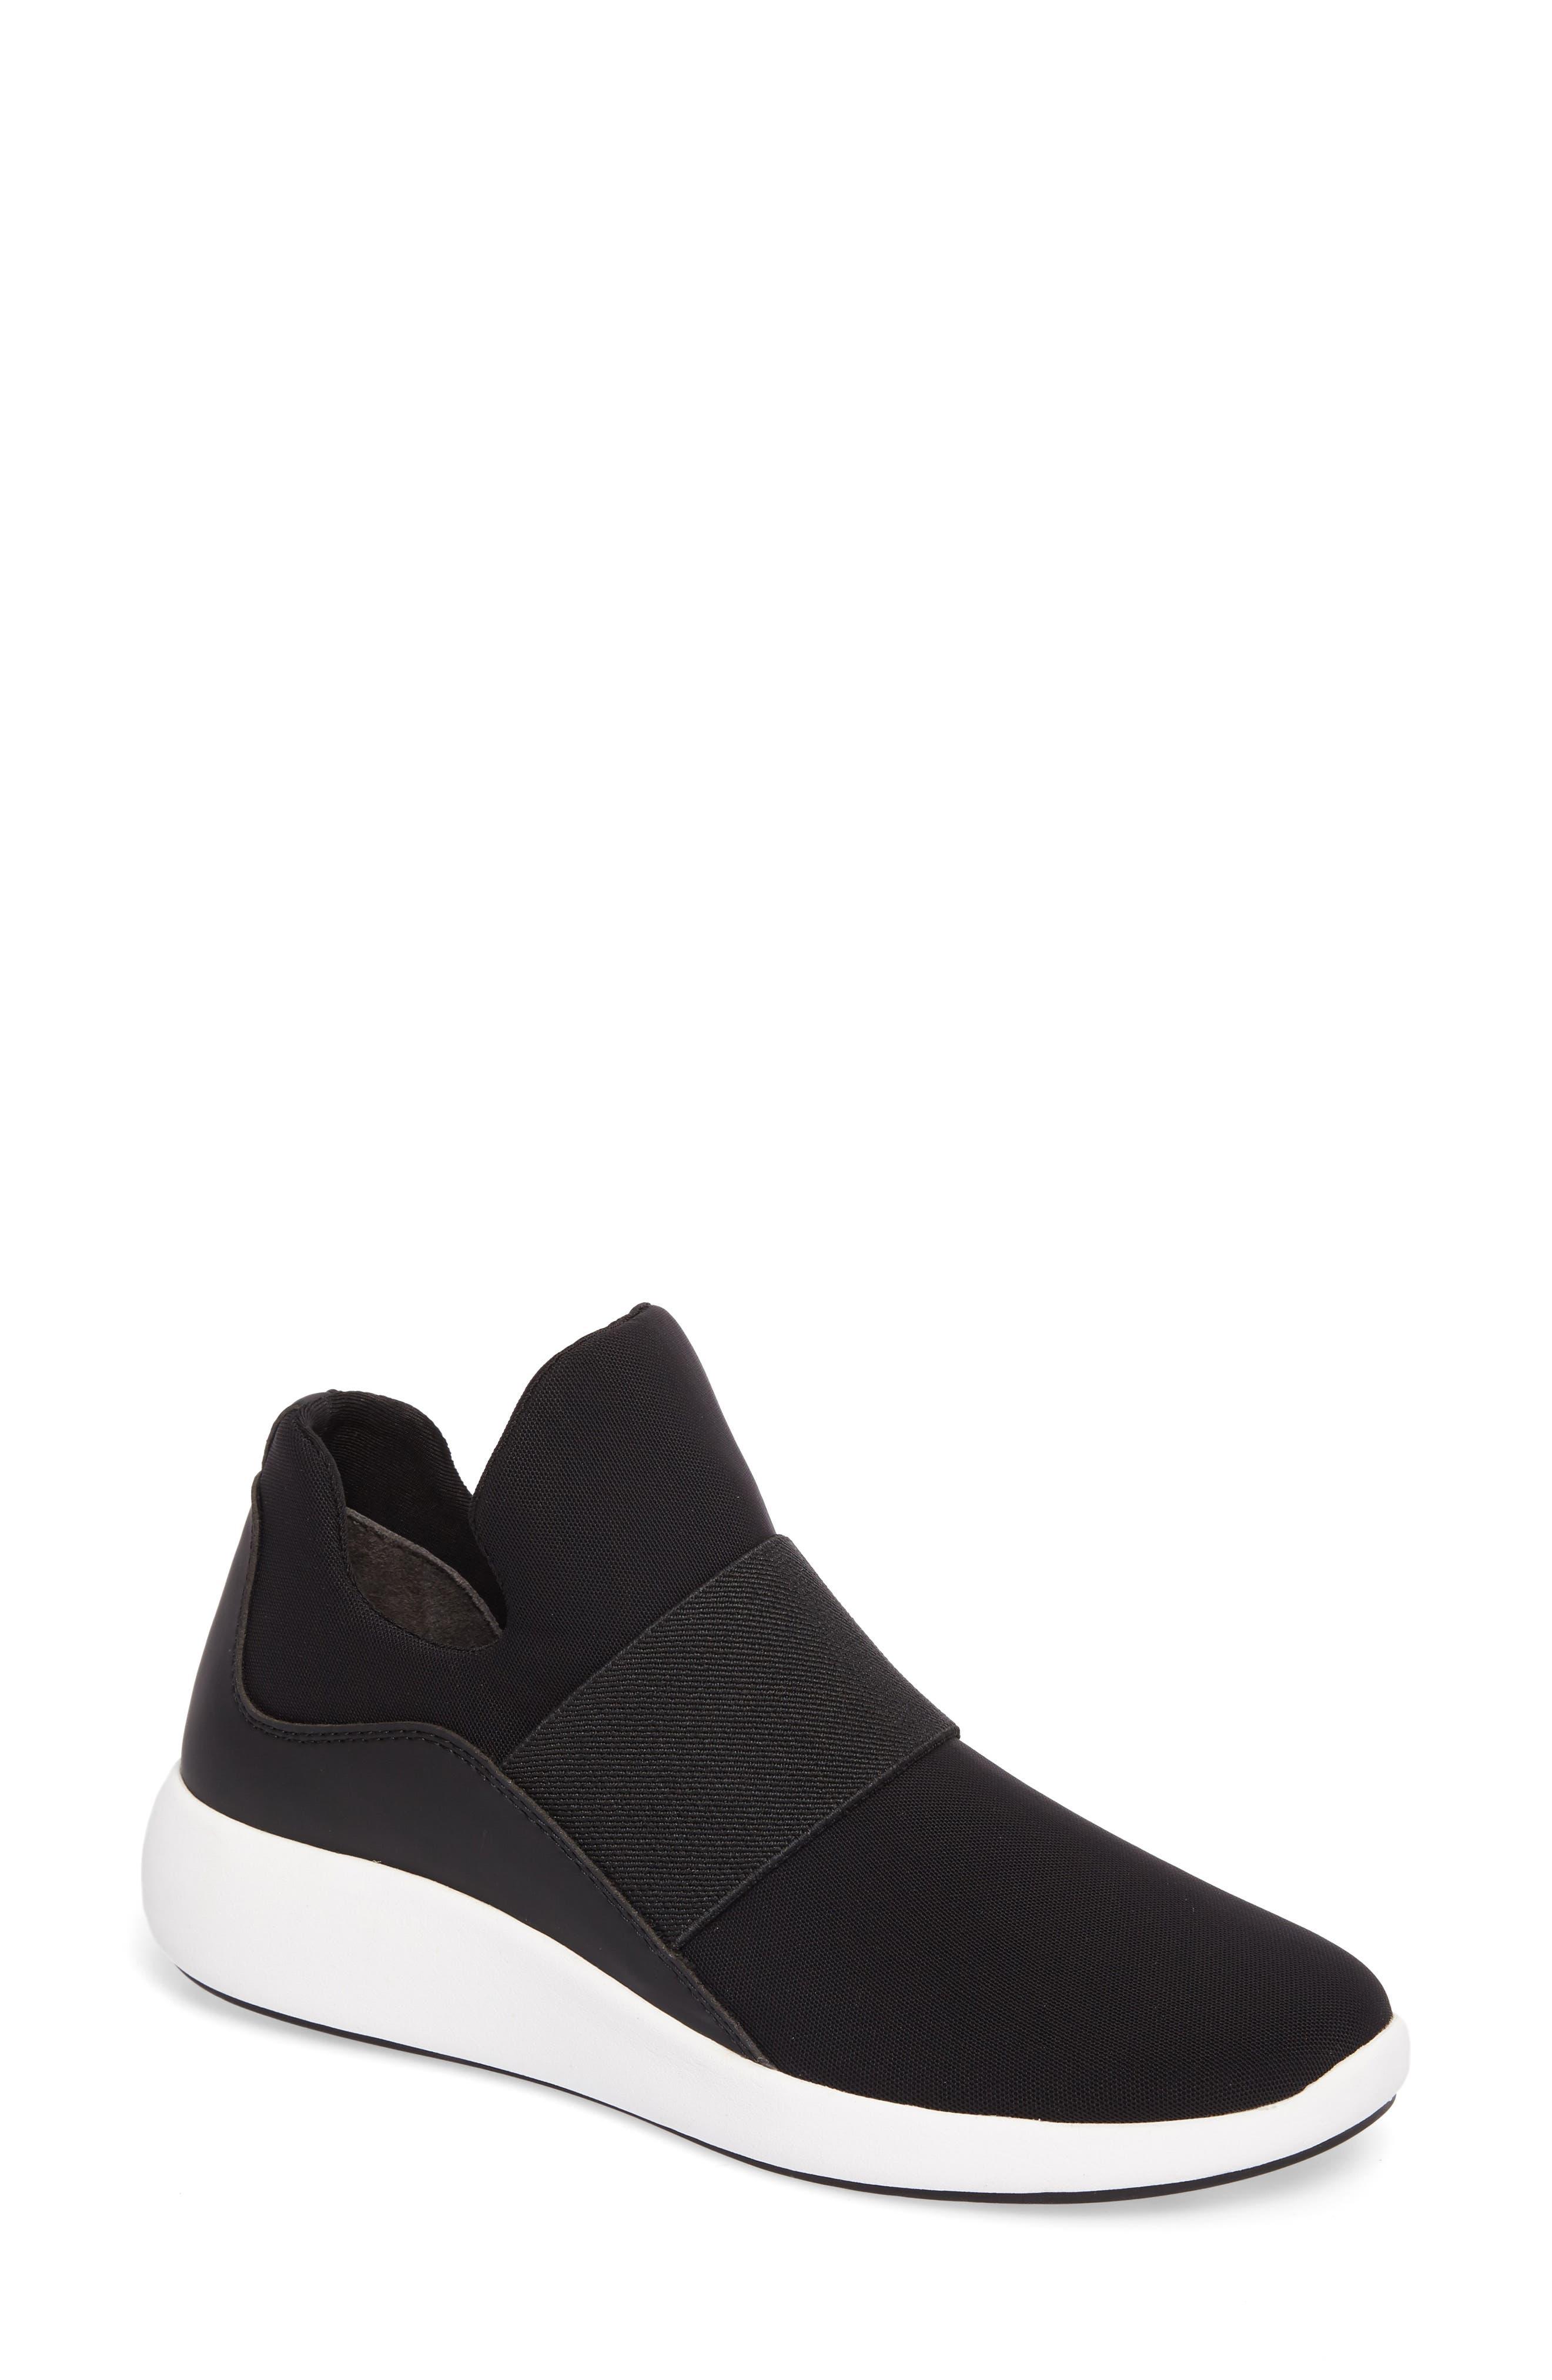 Donna Karan Cory Slip-On Sneaker,                             Main thumbnail 1, color,                             001